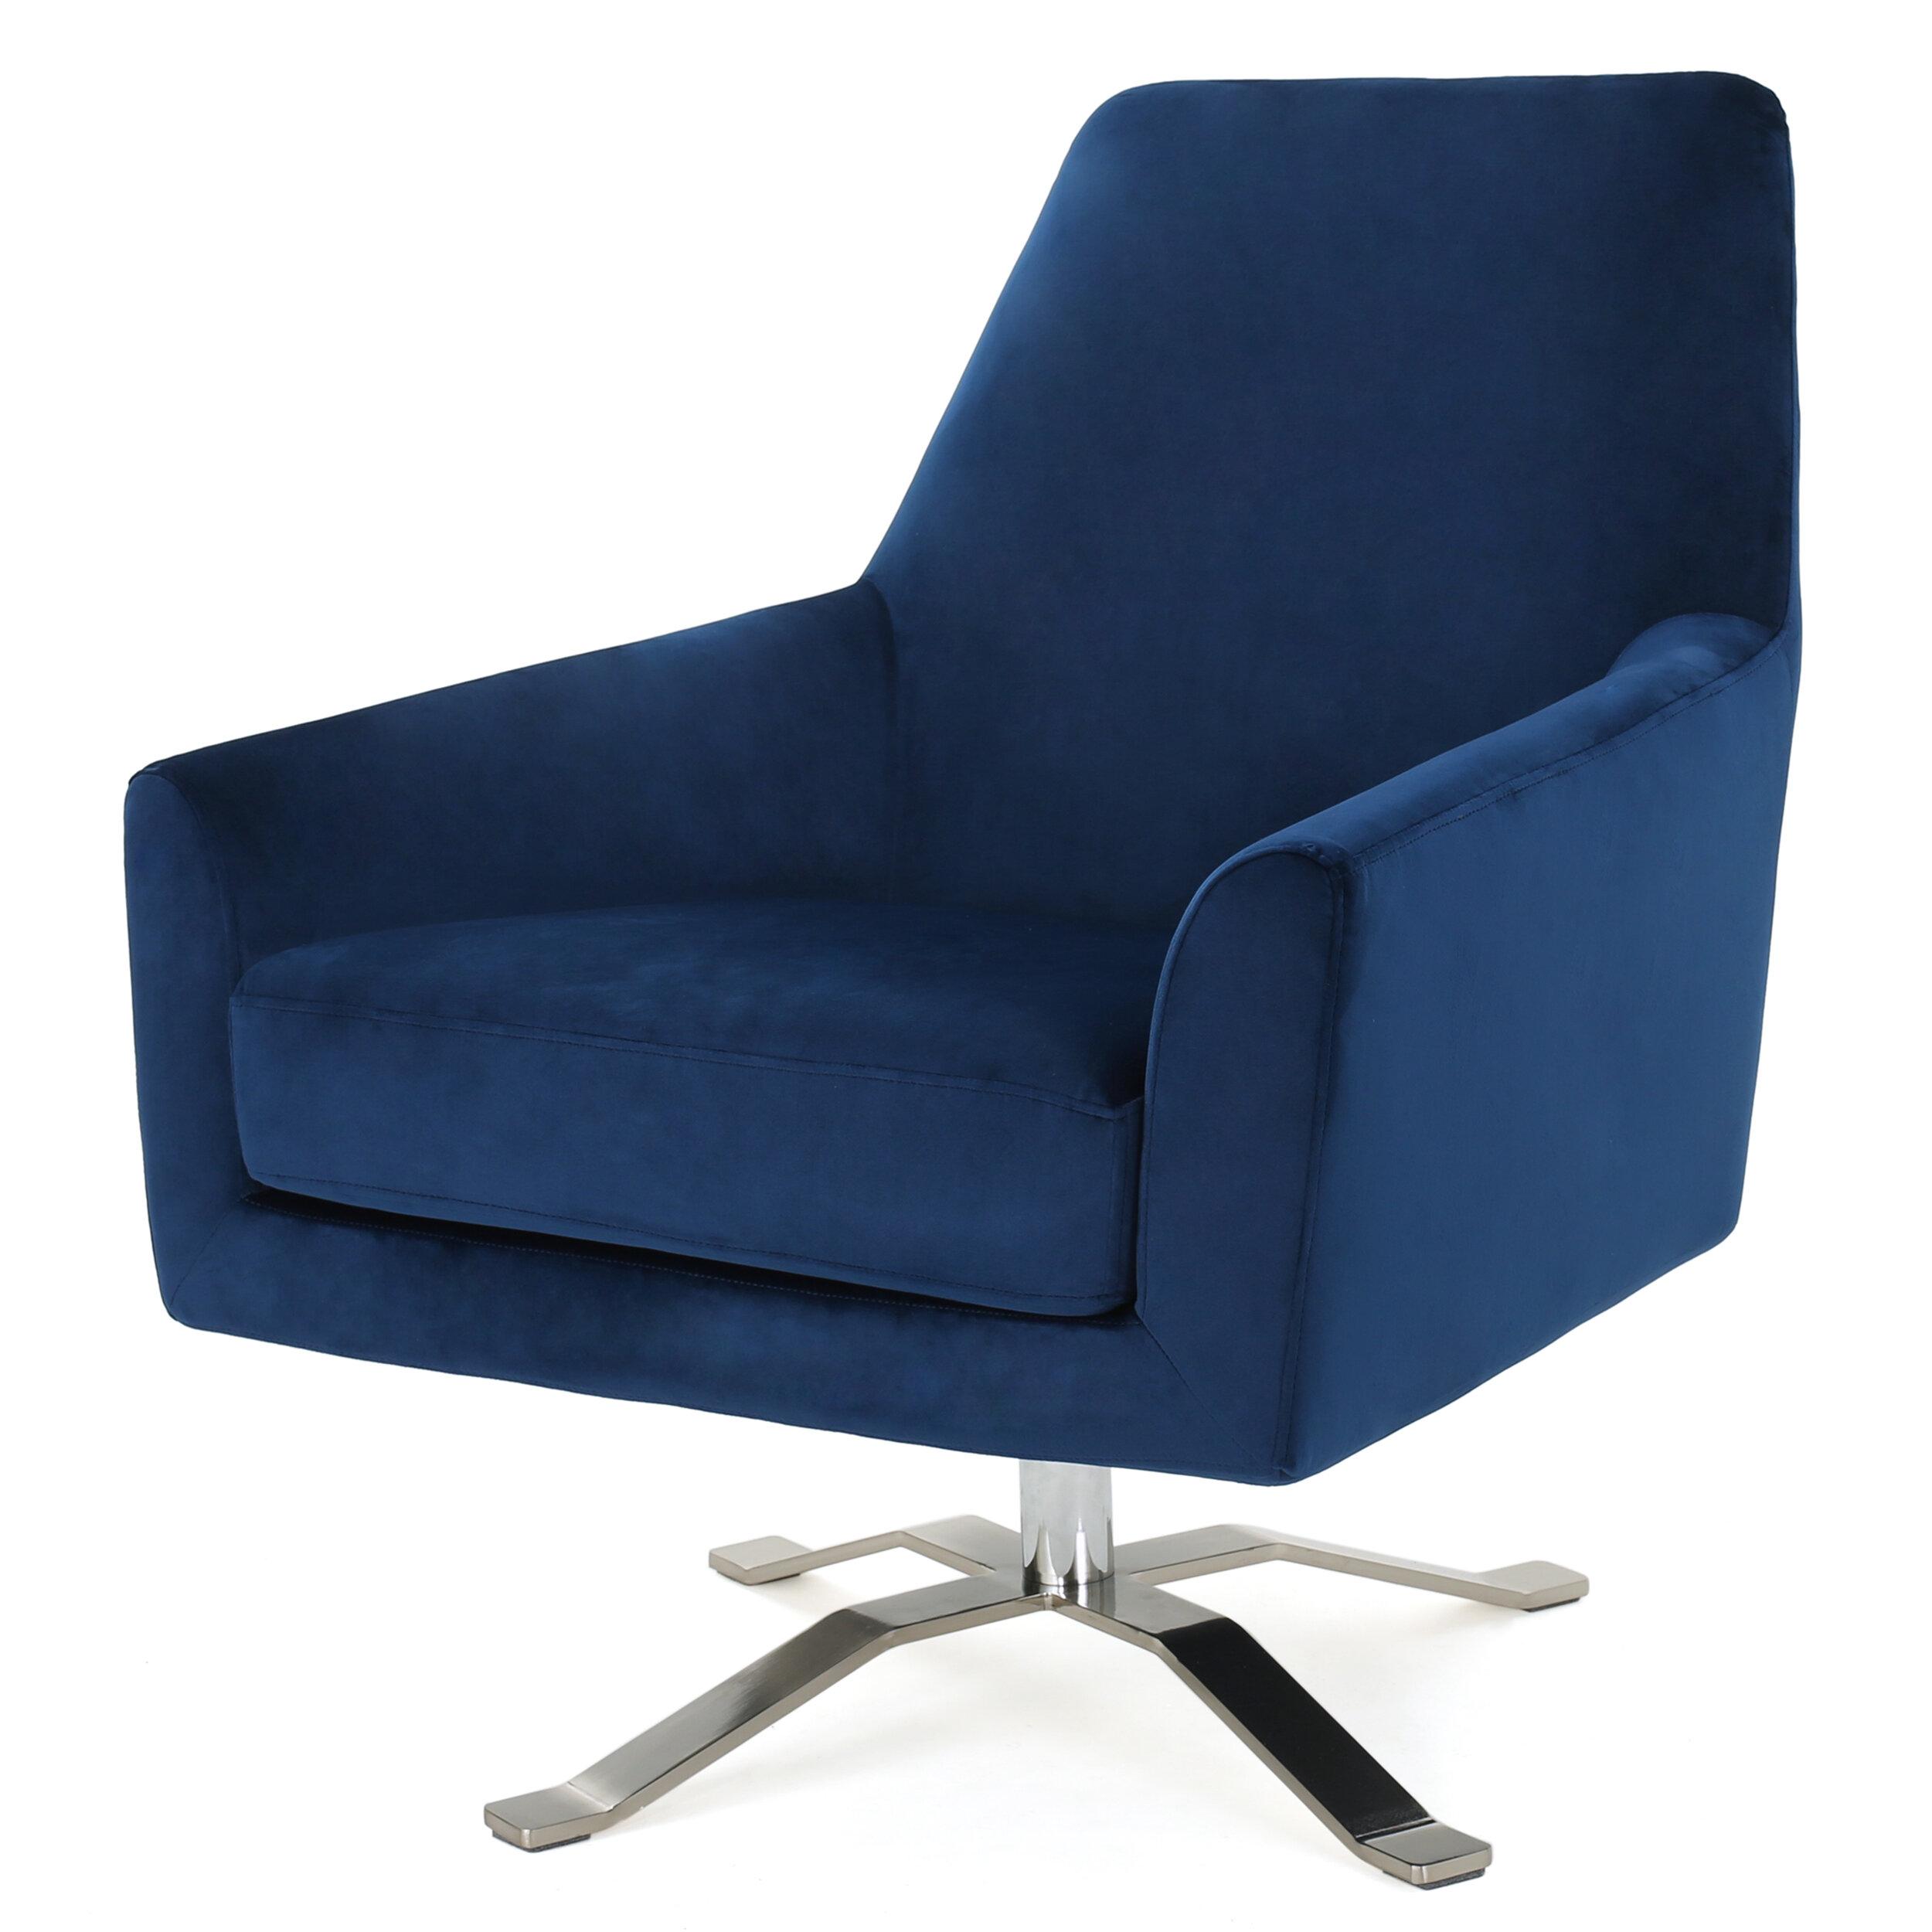 Wondrous Modern Contemporary Cela Arm Chair Allmodern Machost Co Dining Chair Design Ideas Machostcouk